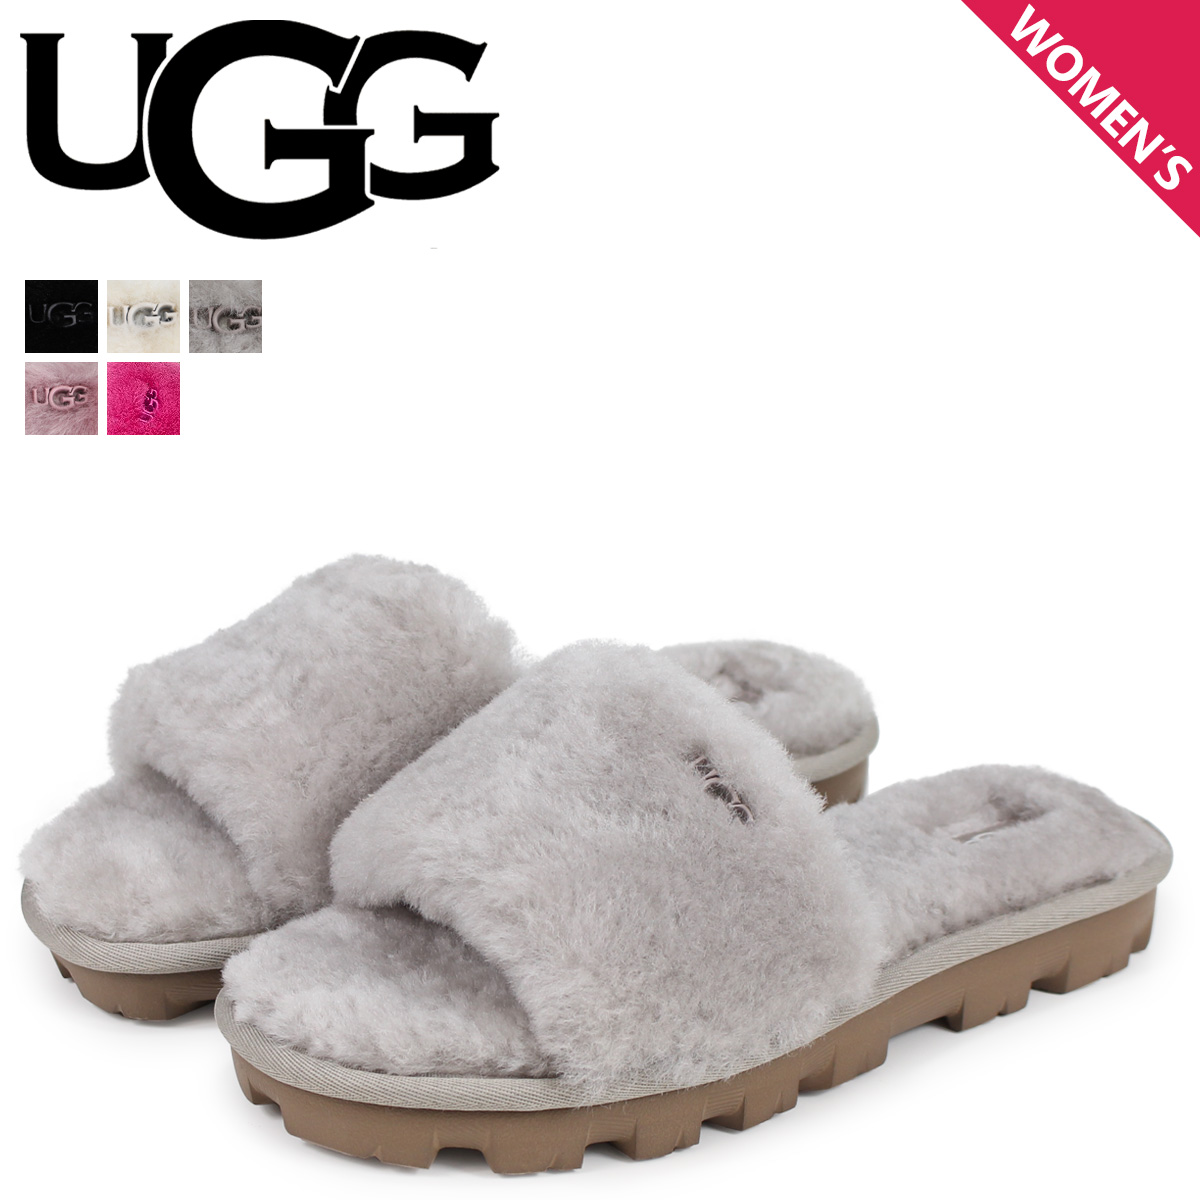 0364742dde32 アグ UGG sandals farce ride sandals Cosette Lady s mouton sheepskin WOMENS  COZETTE 1100892  1 18 Shinnyu load